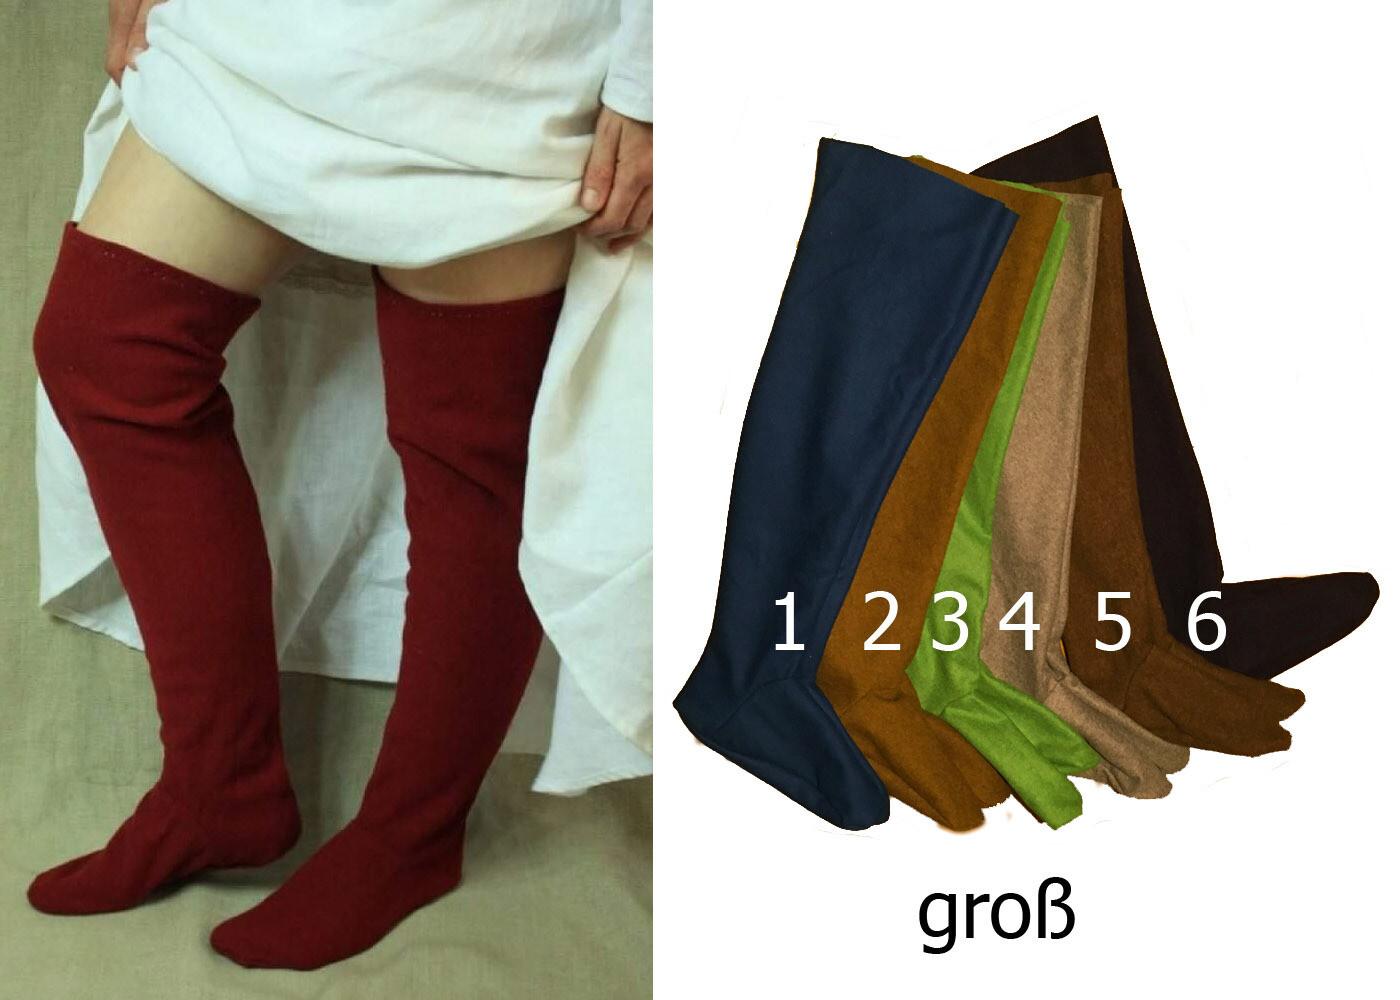 Socken Schuhgröße 42-46 (groß)